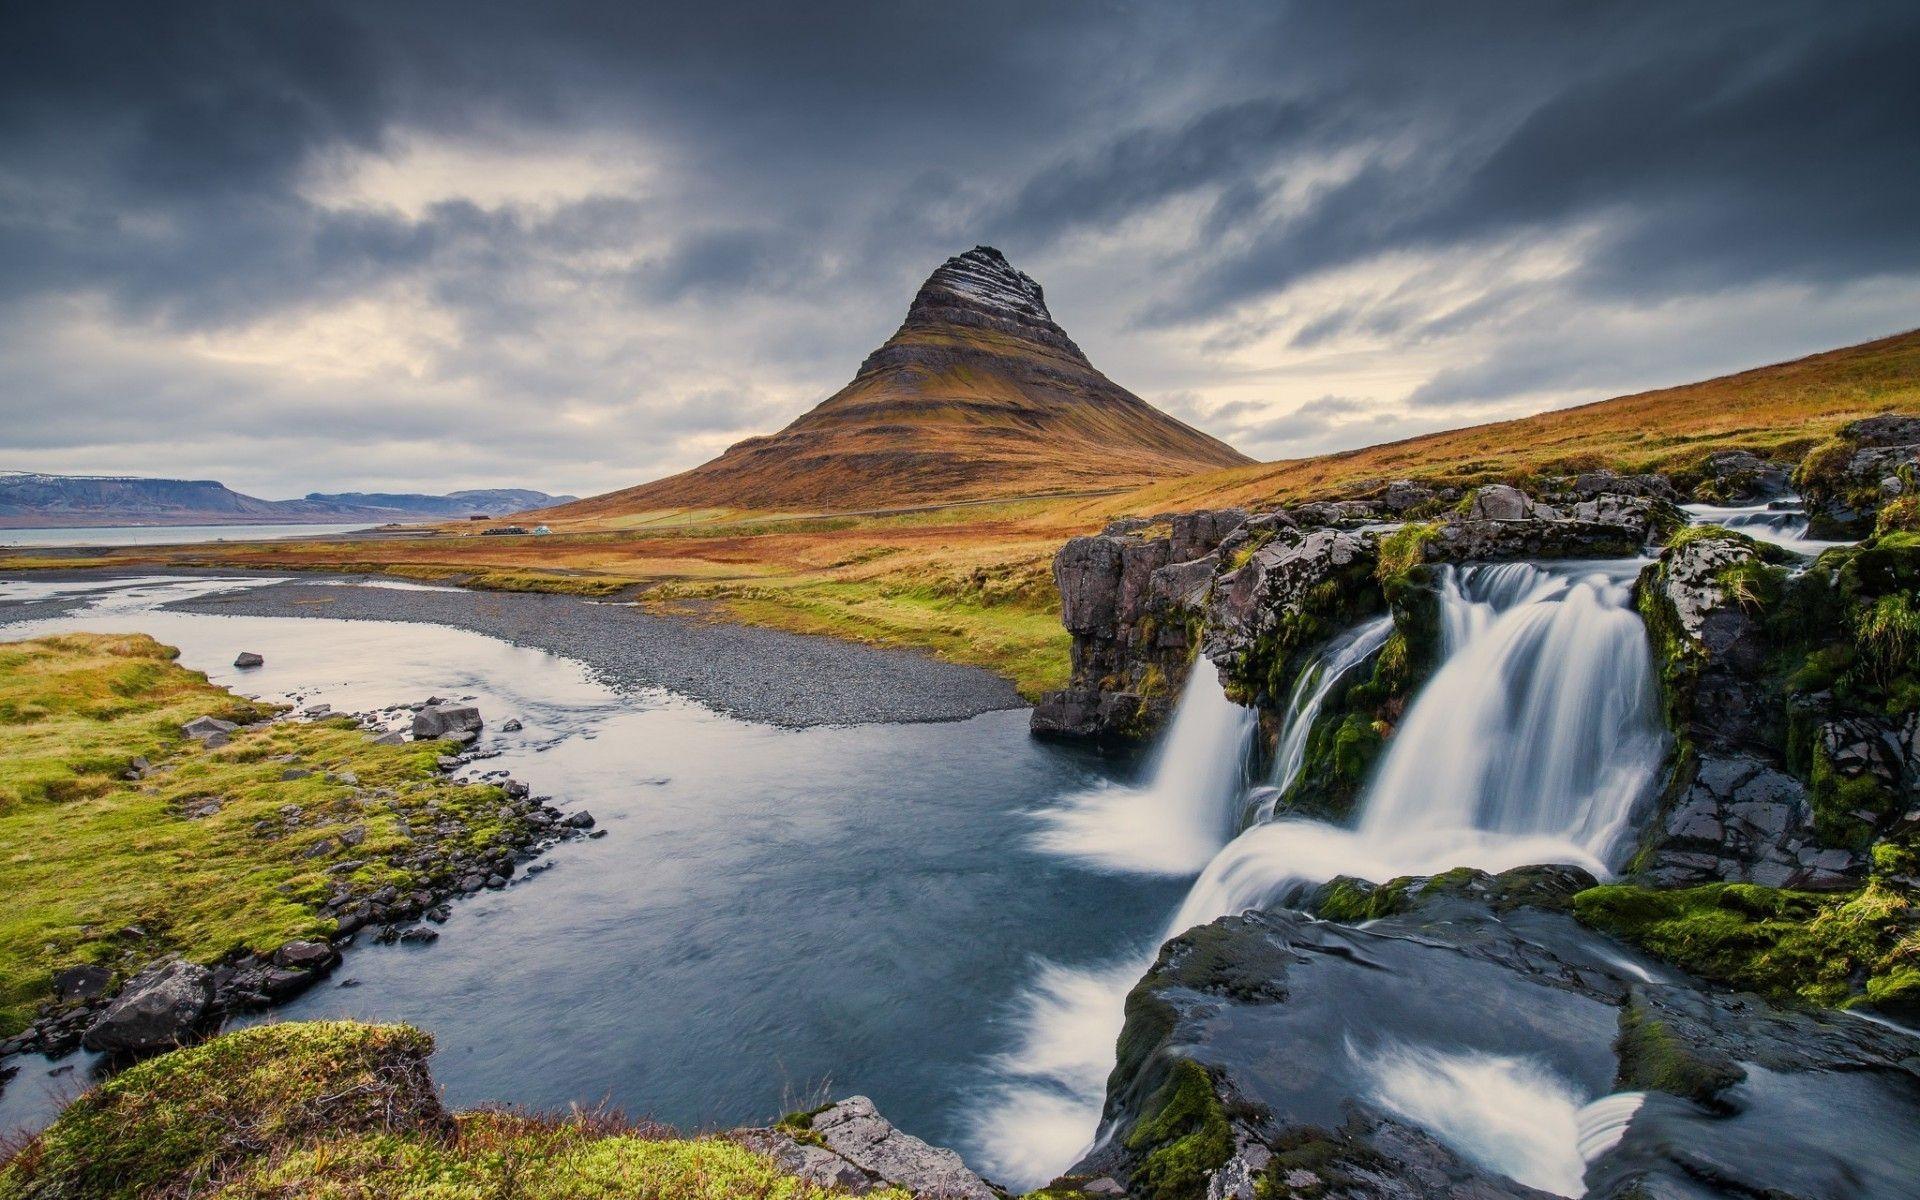 Iceland Wallpaper Wide For Desktop Wallpaper